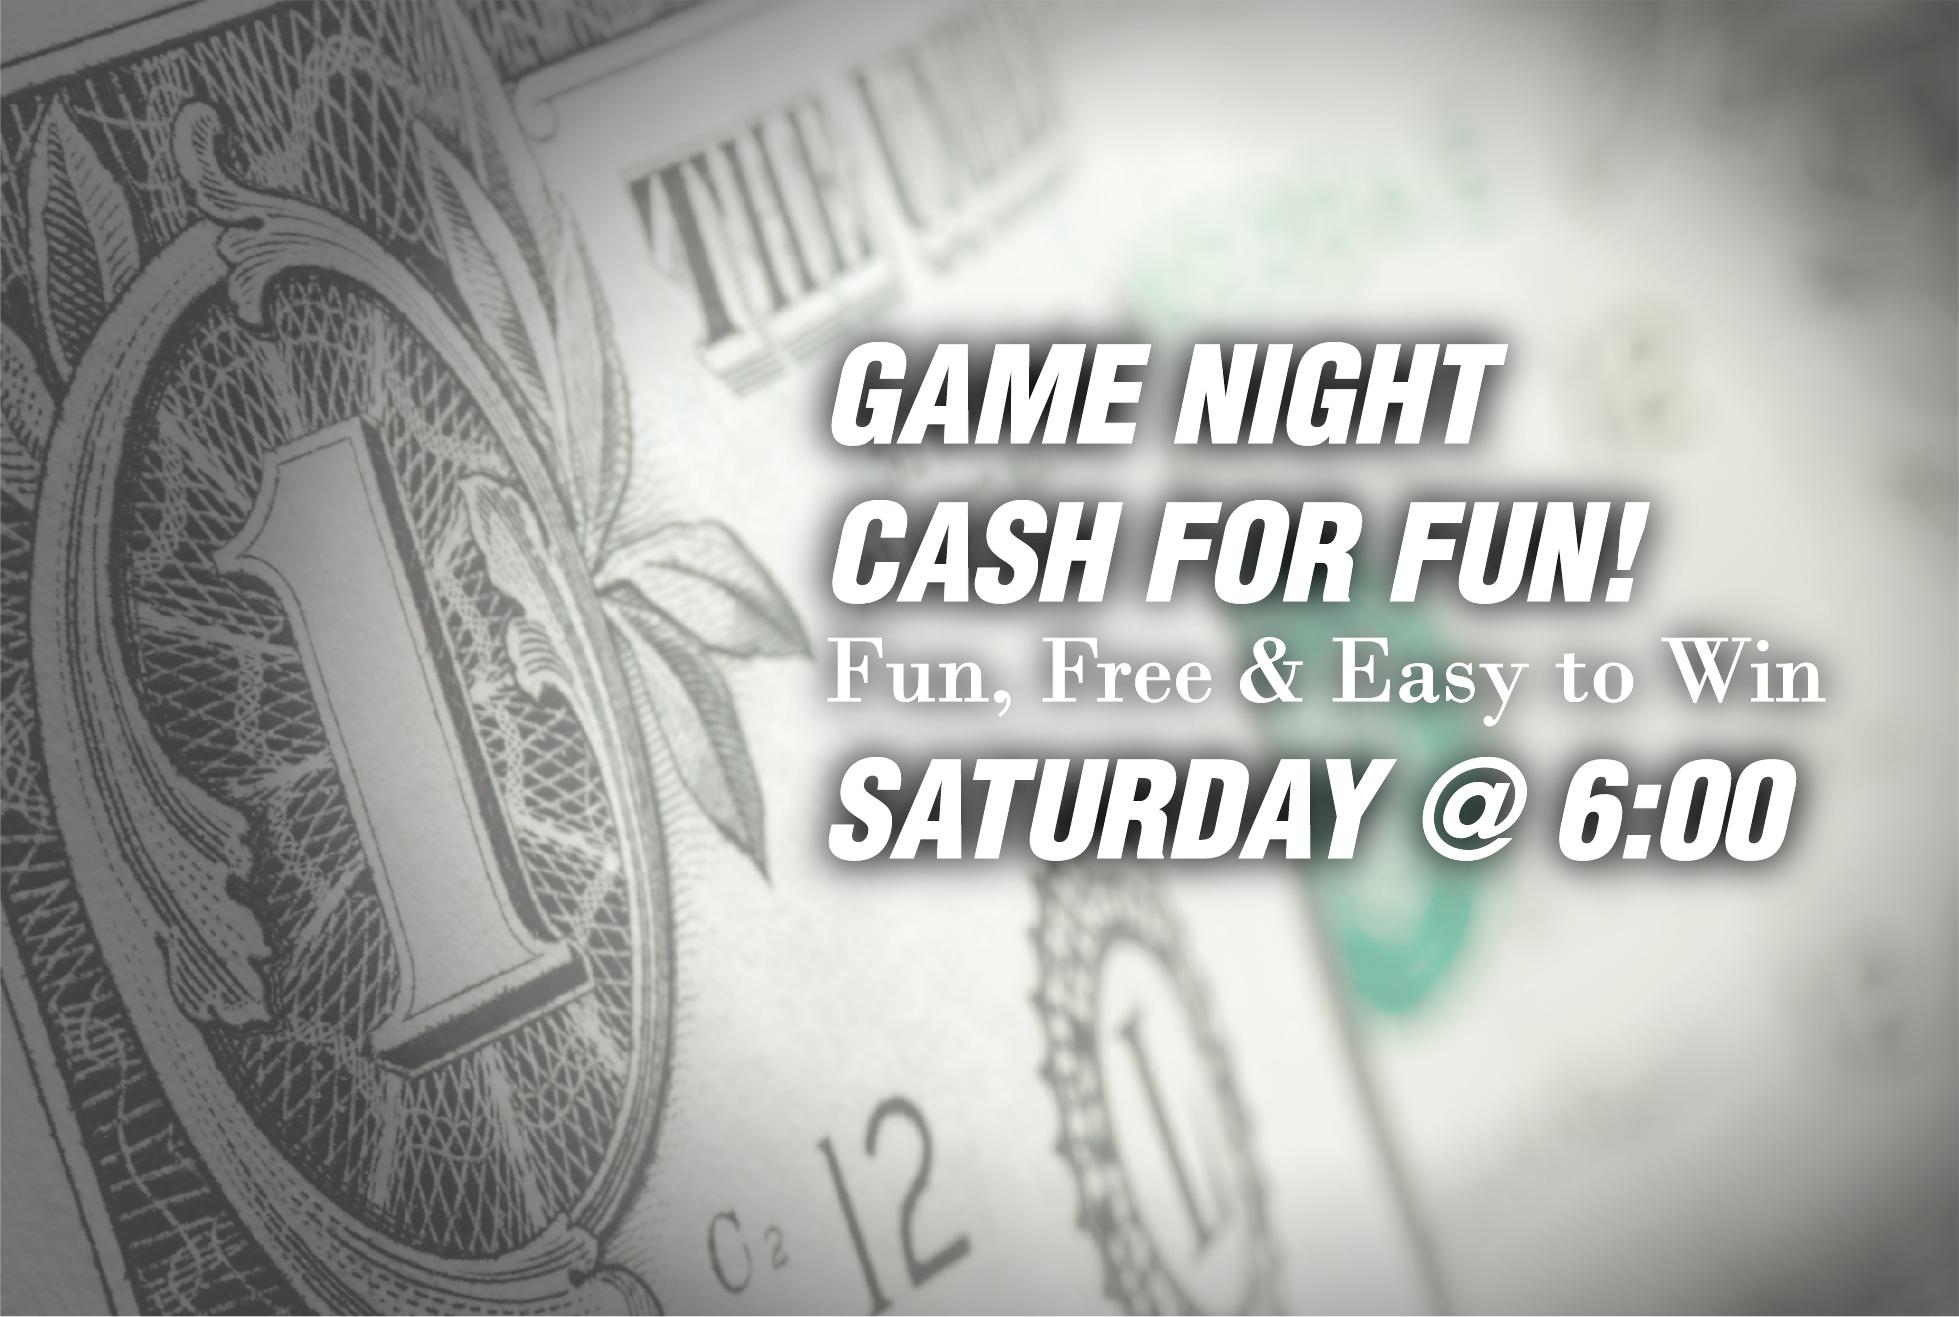 GameNight CashforFunSatArtboard 11@300x.png